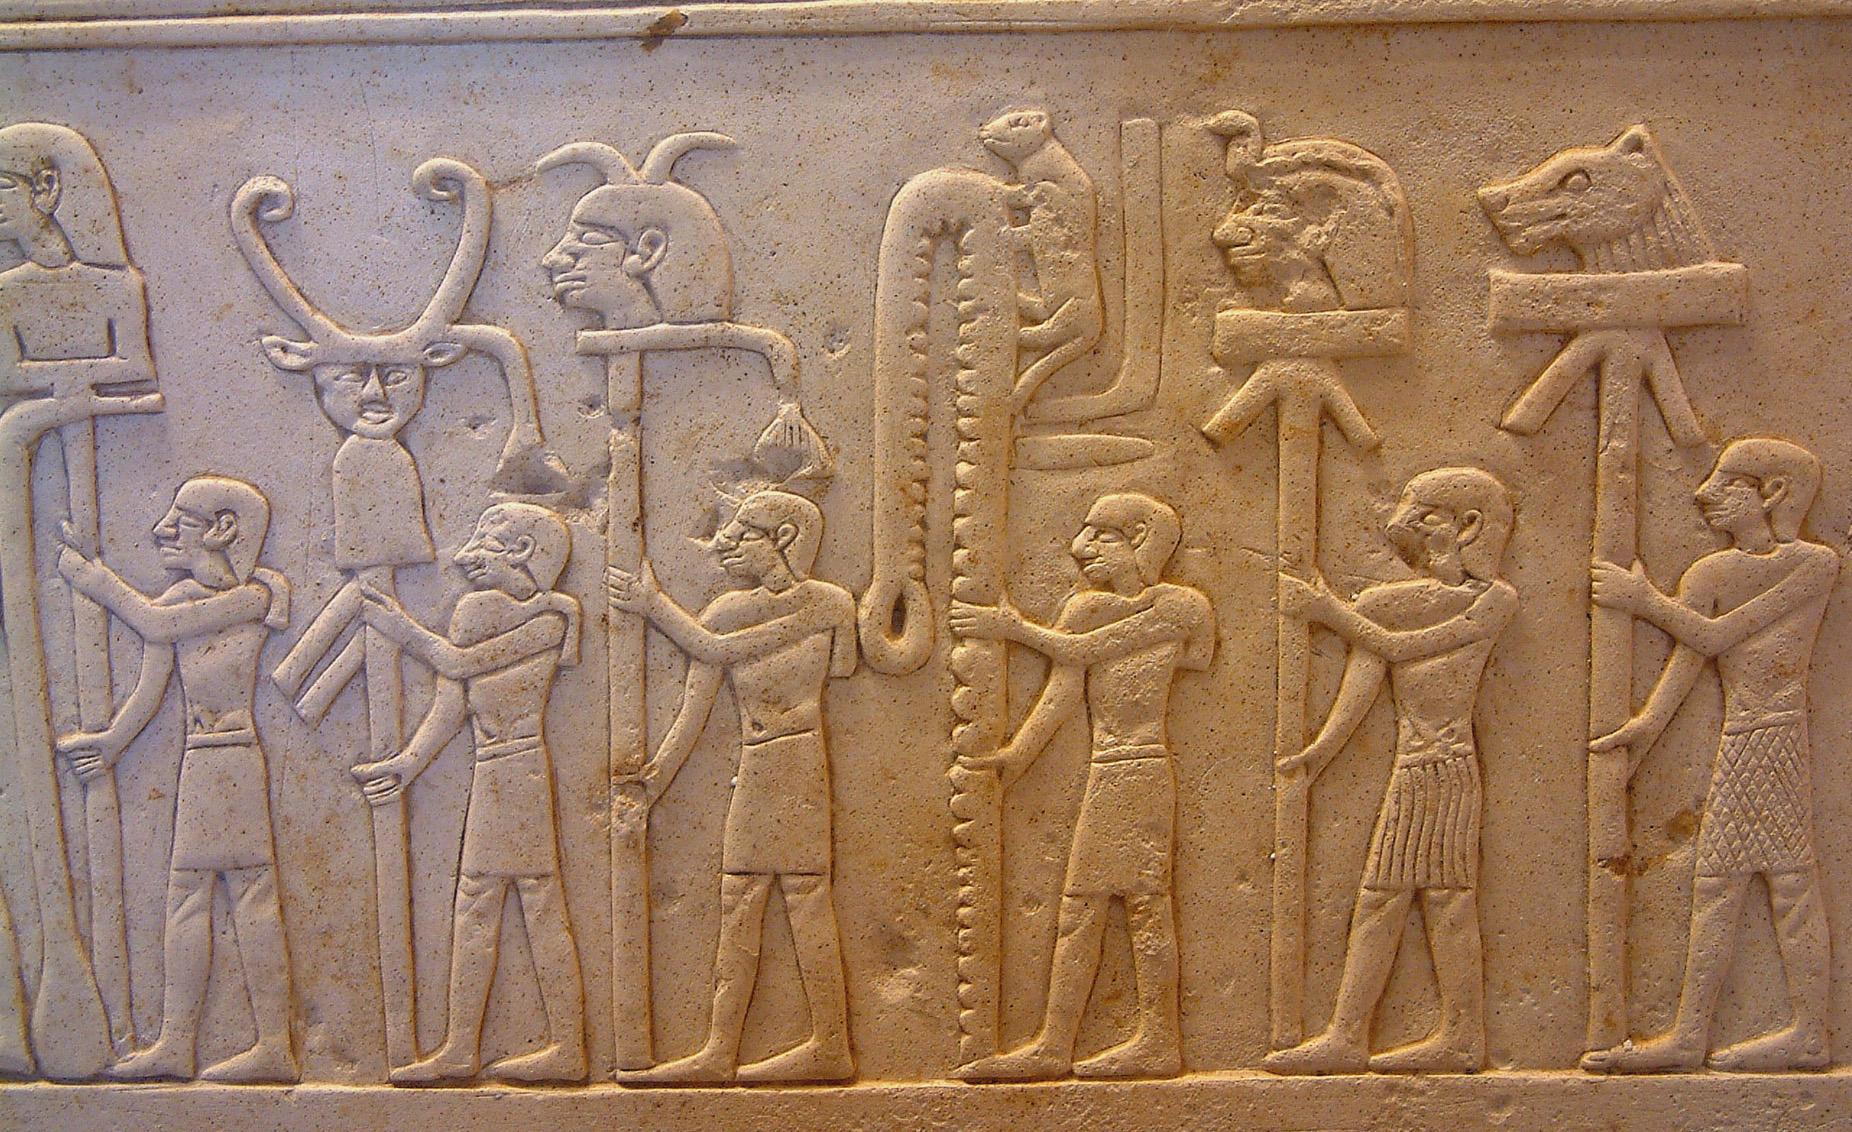 http://upload.wikimedia.org/wikipedia/commons/6/63/Egypte_louvre_251_totem.jpg